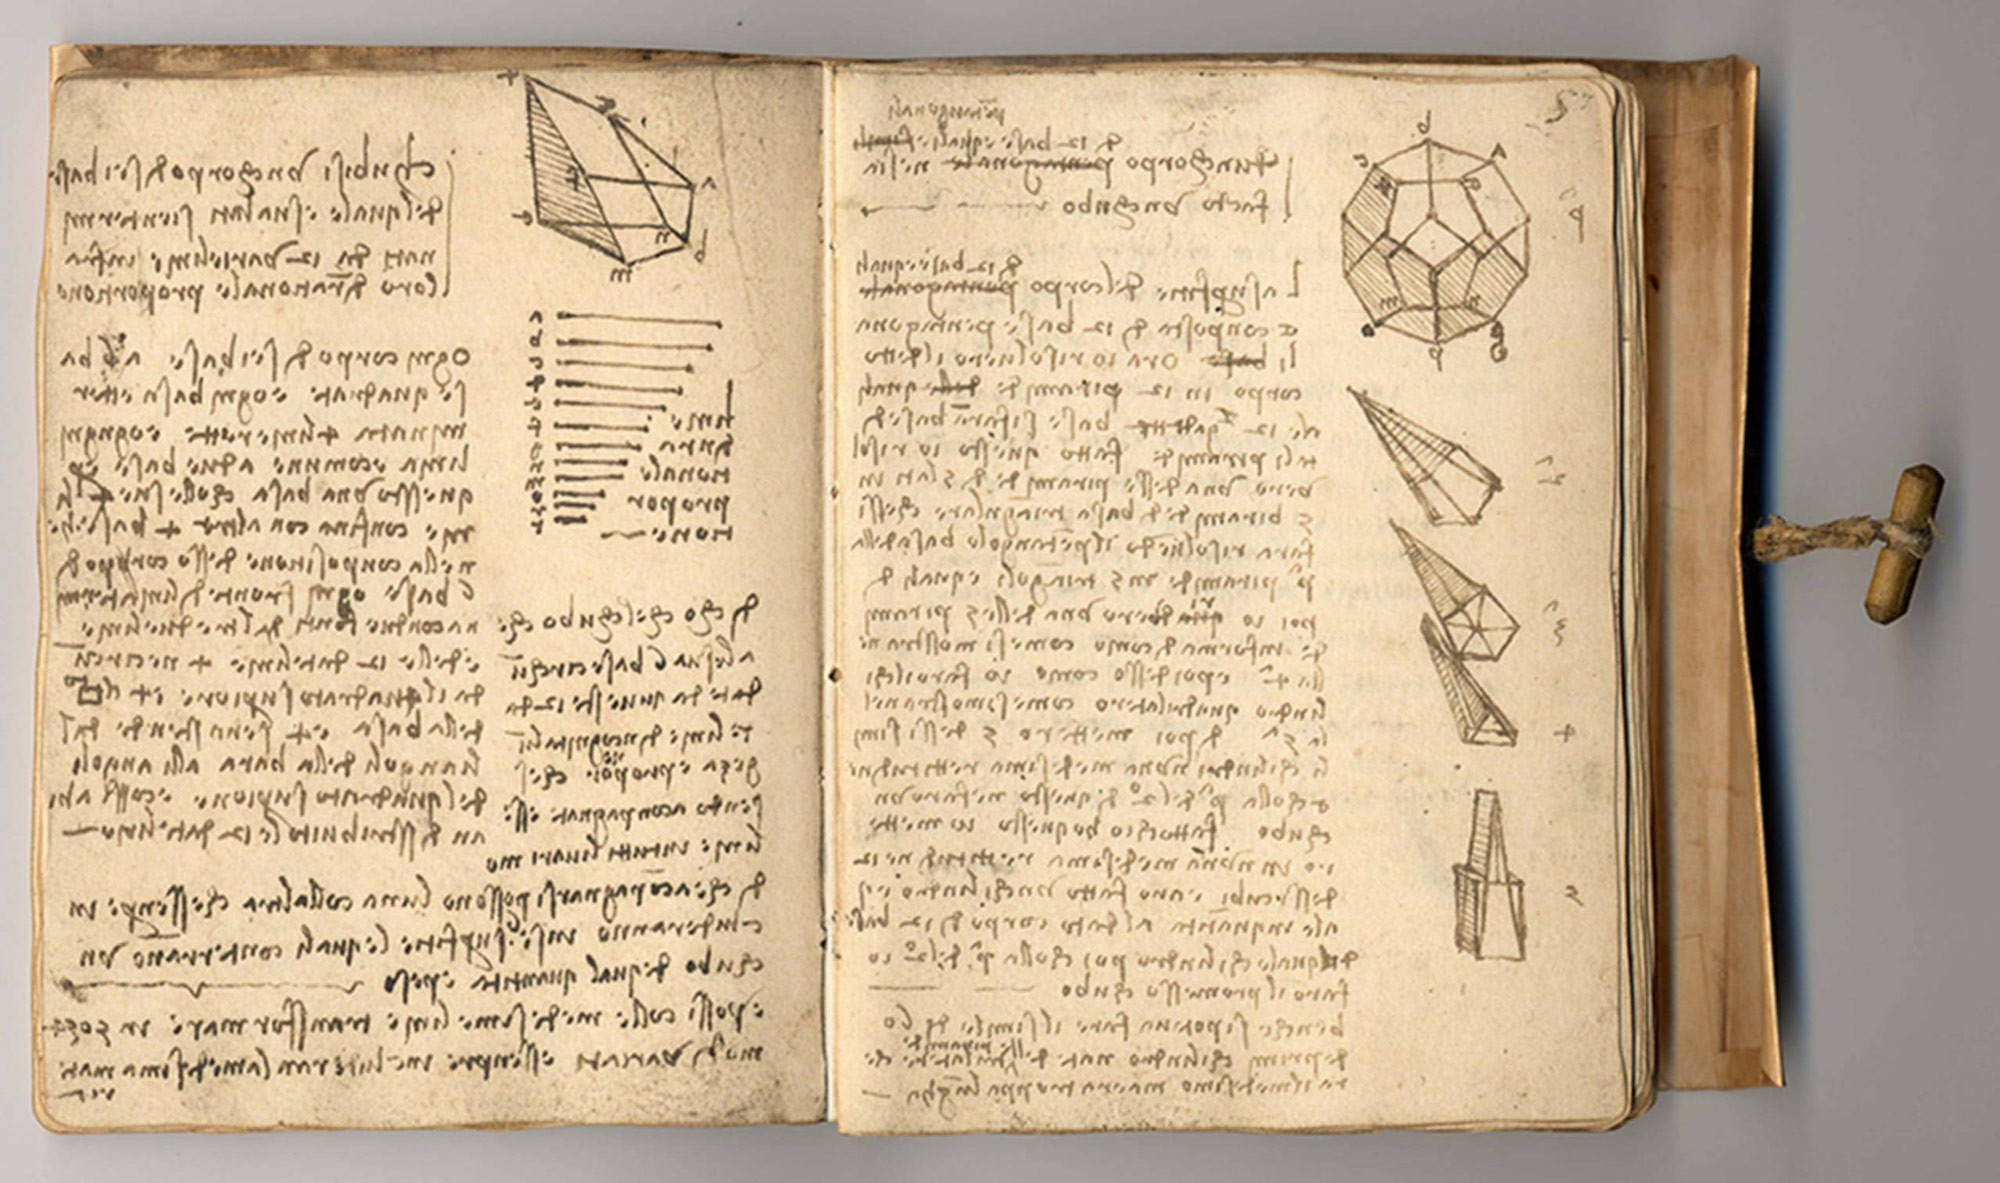 Codex Forster II Leonardo da Vinci late 15th early 16th century Italy